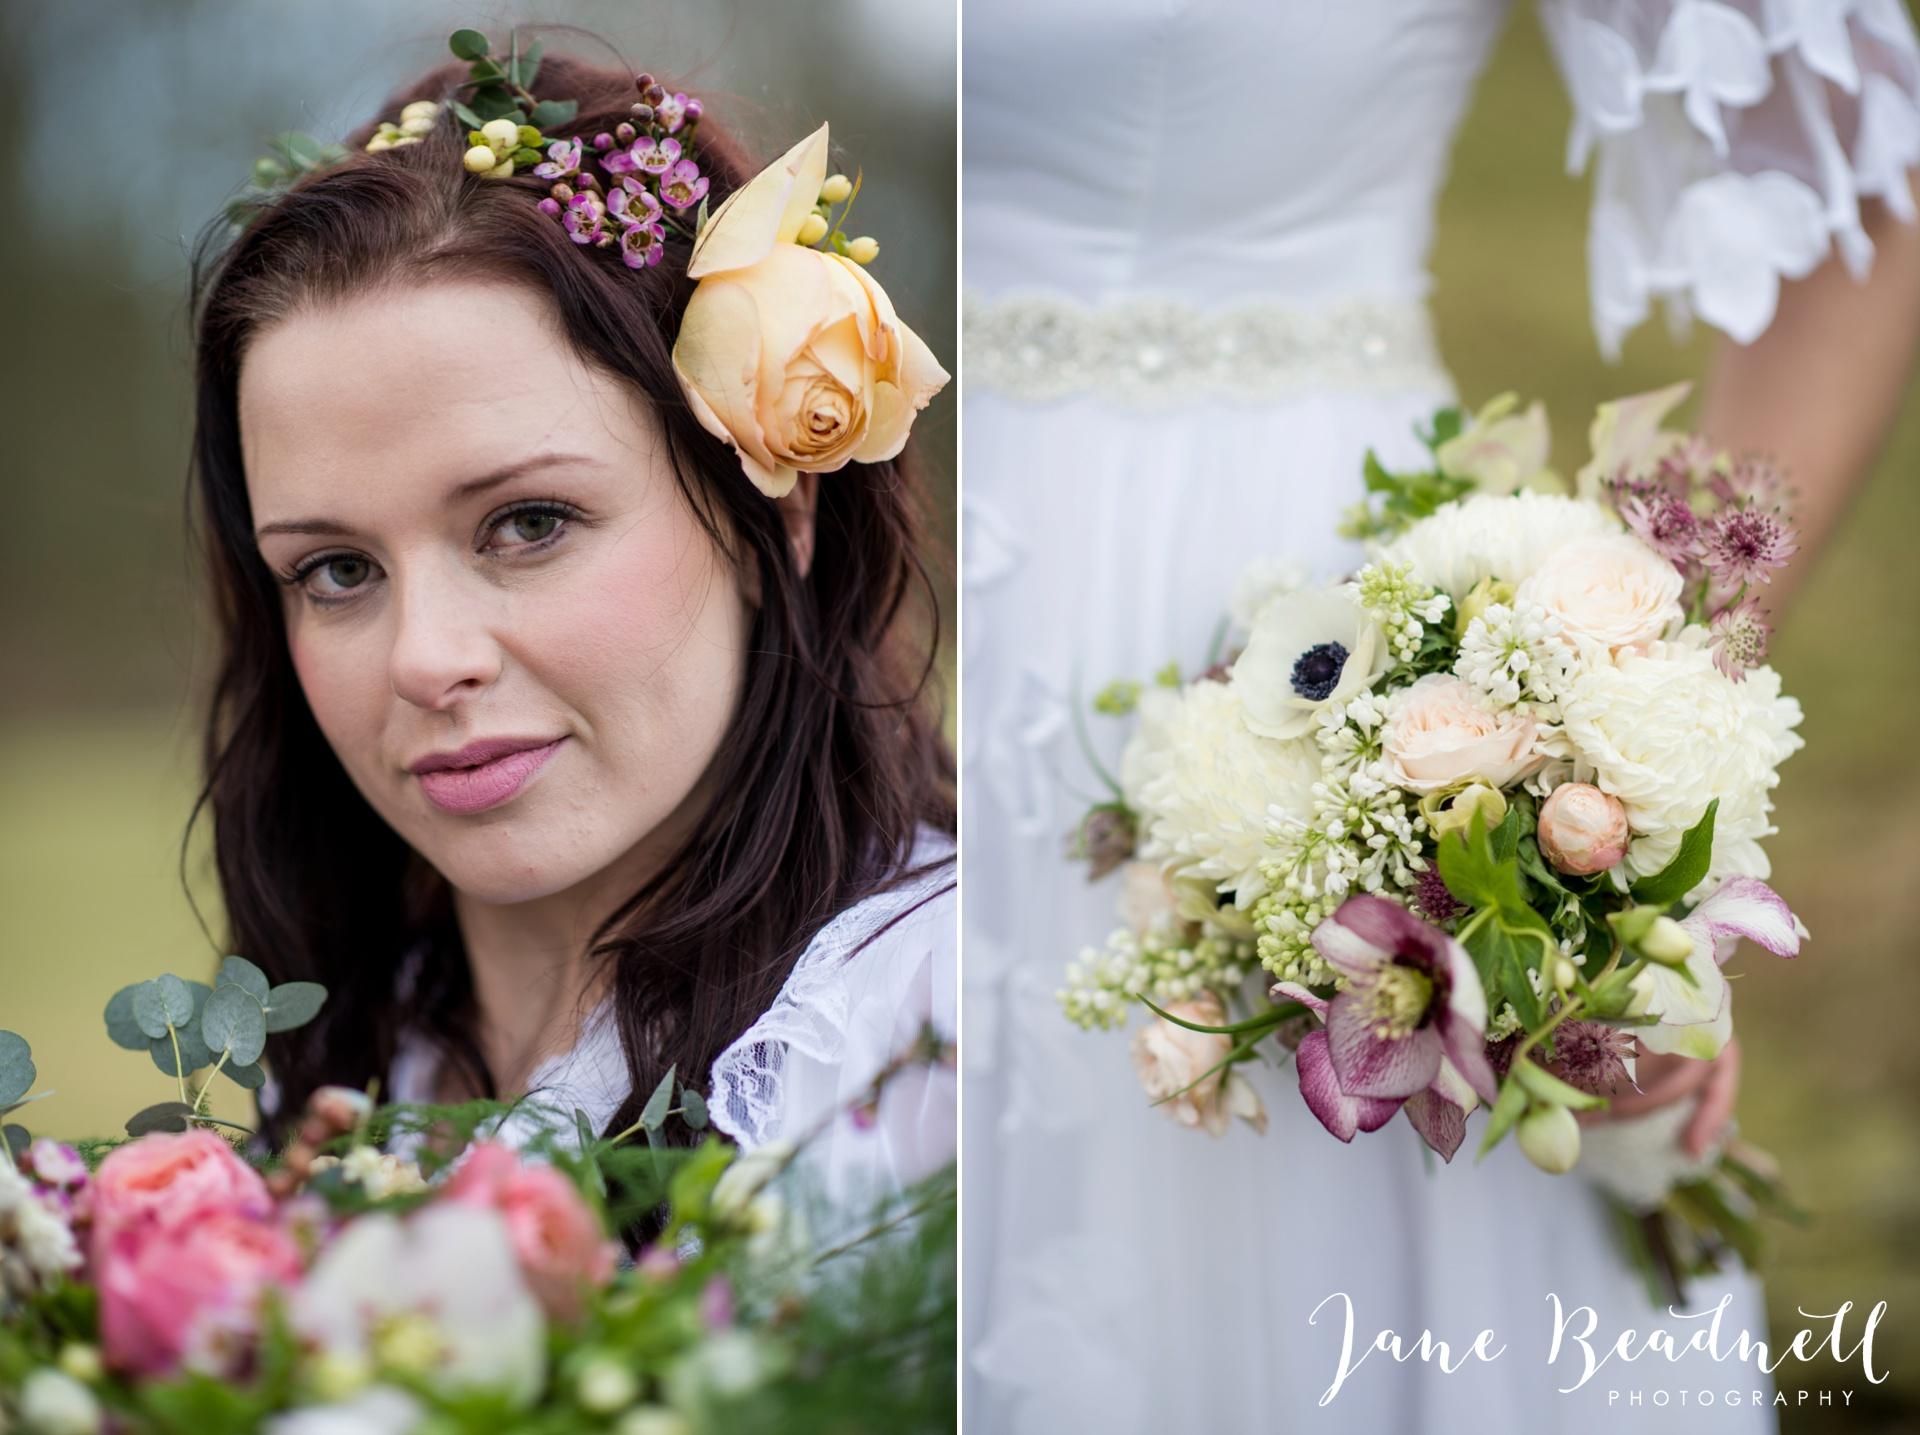 Jane Beadnell fine art wedding photographer Swinton Park9